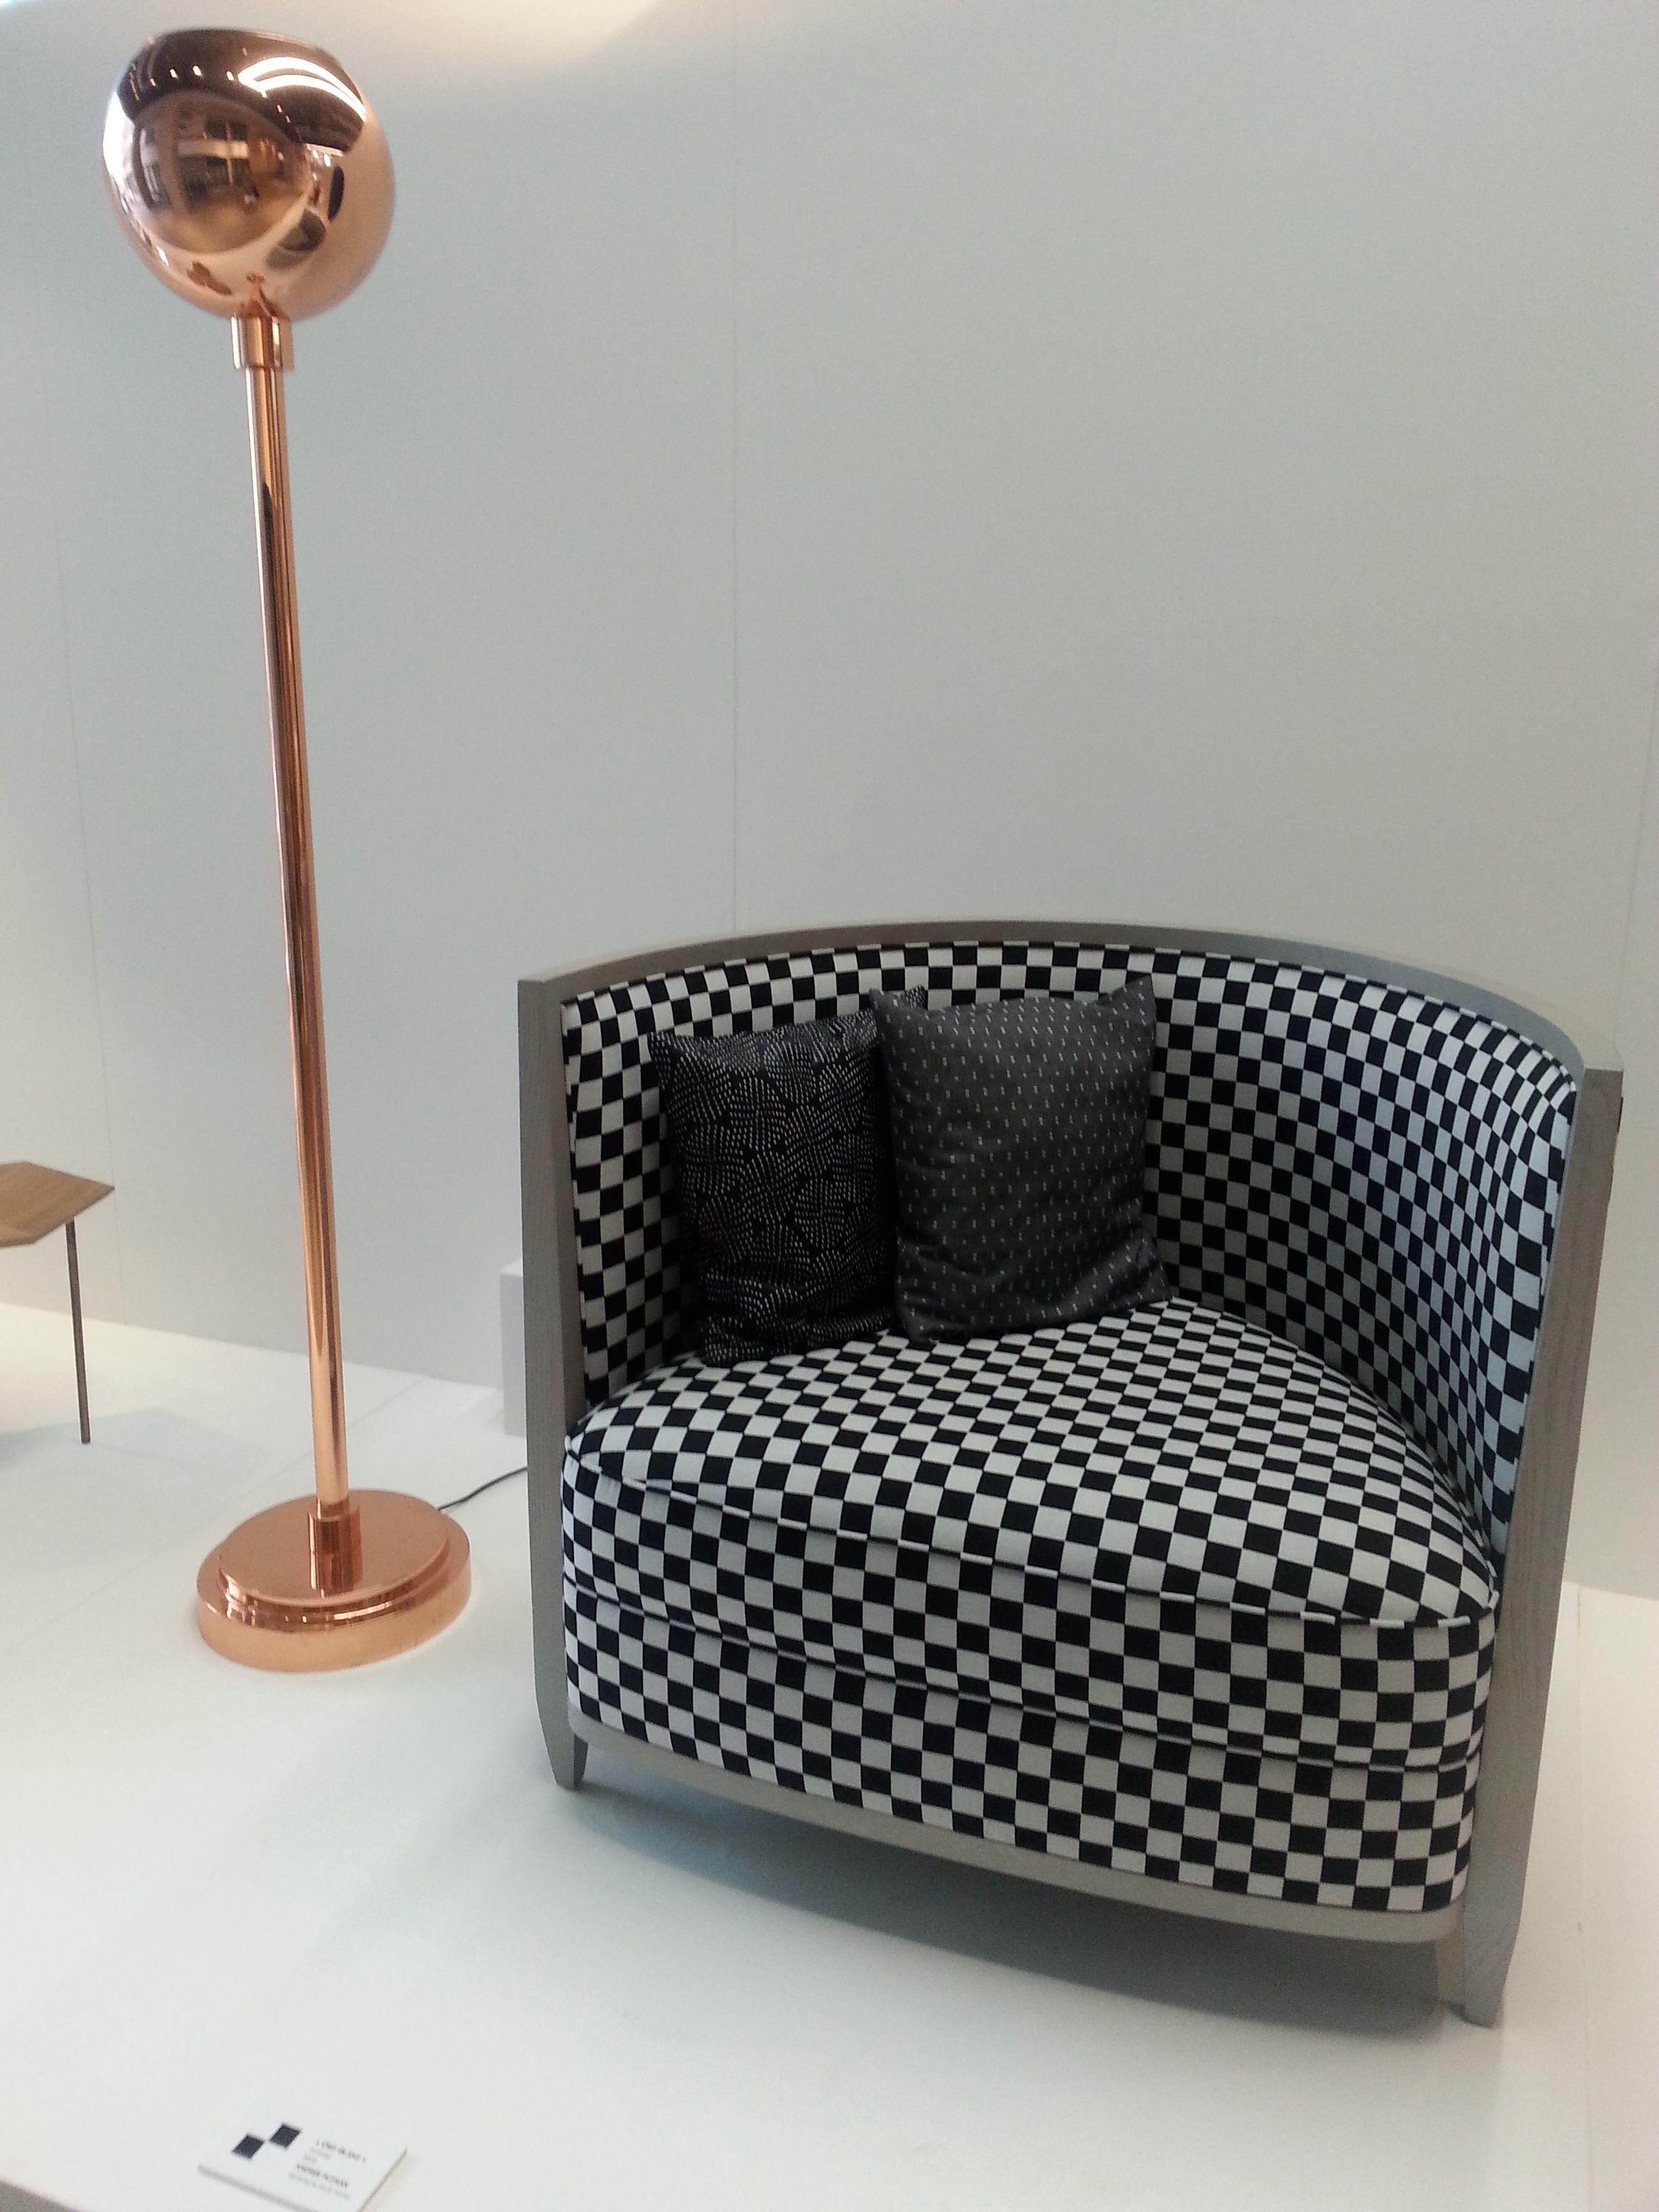 luminator putman edition clair de jour putman edition andree putman pinterest. Black Bedroom Furniture Sets. Home Design Ideas